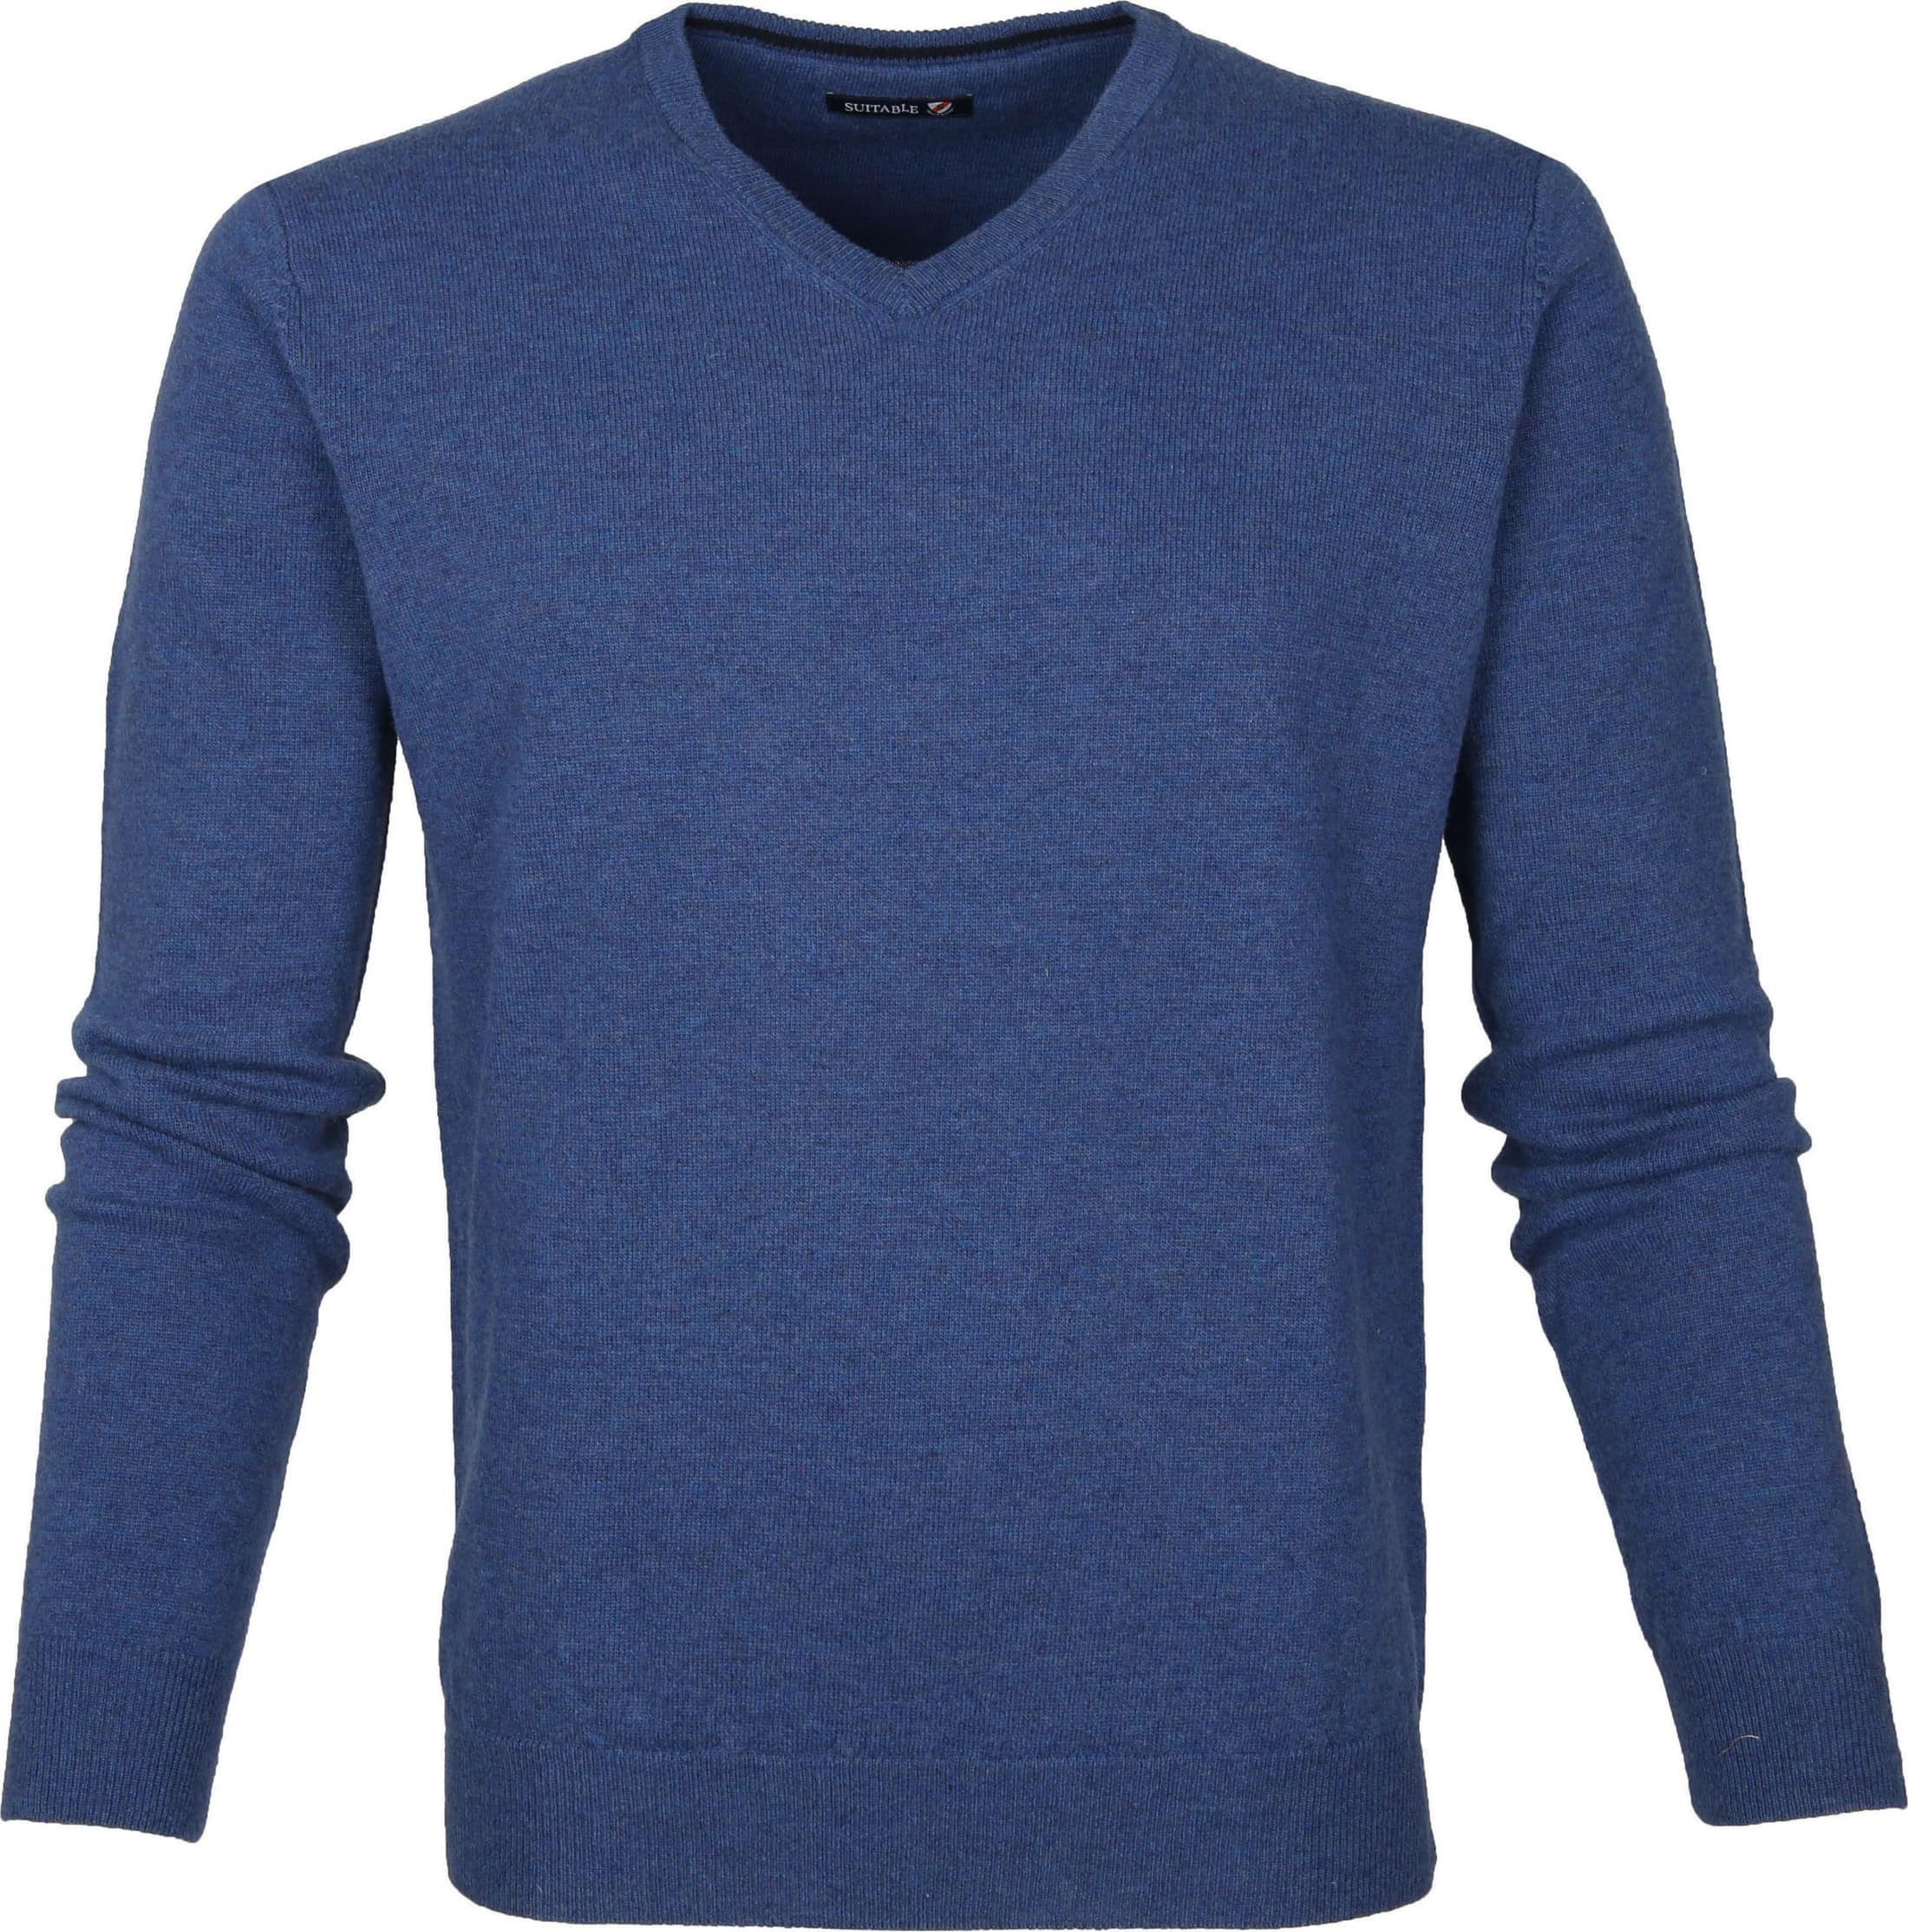 Suitable Pullover Lamswol V-Hals Blauw foto 0